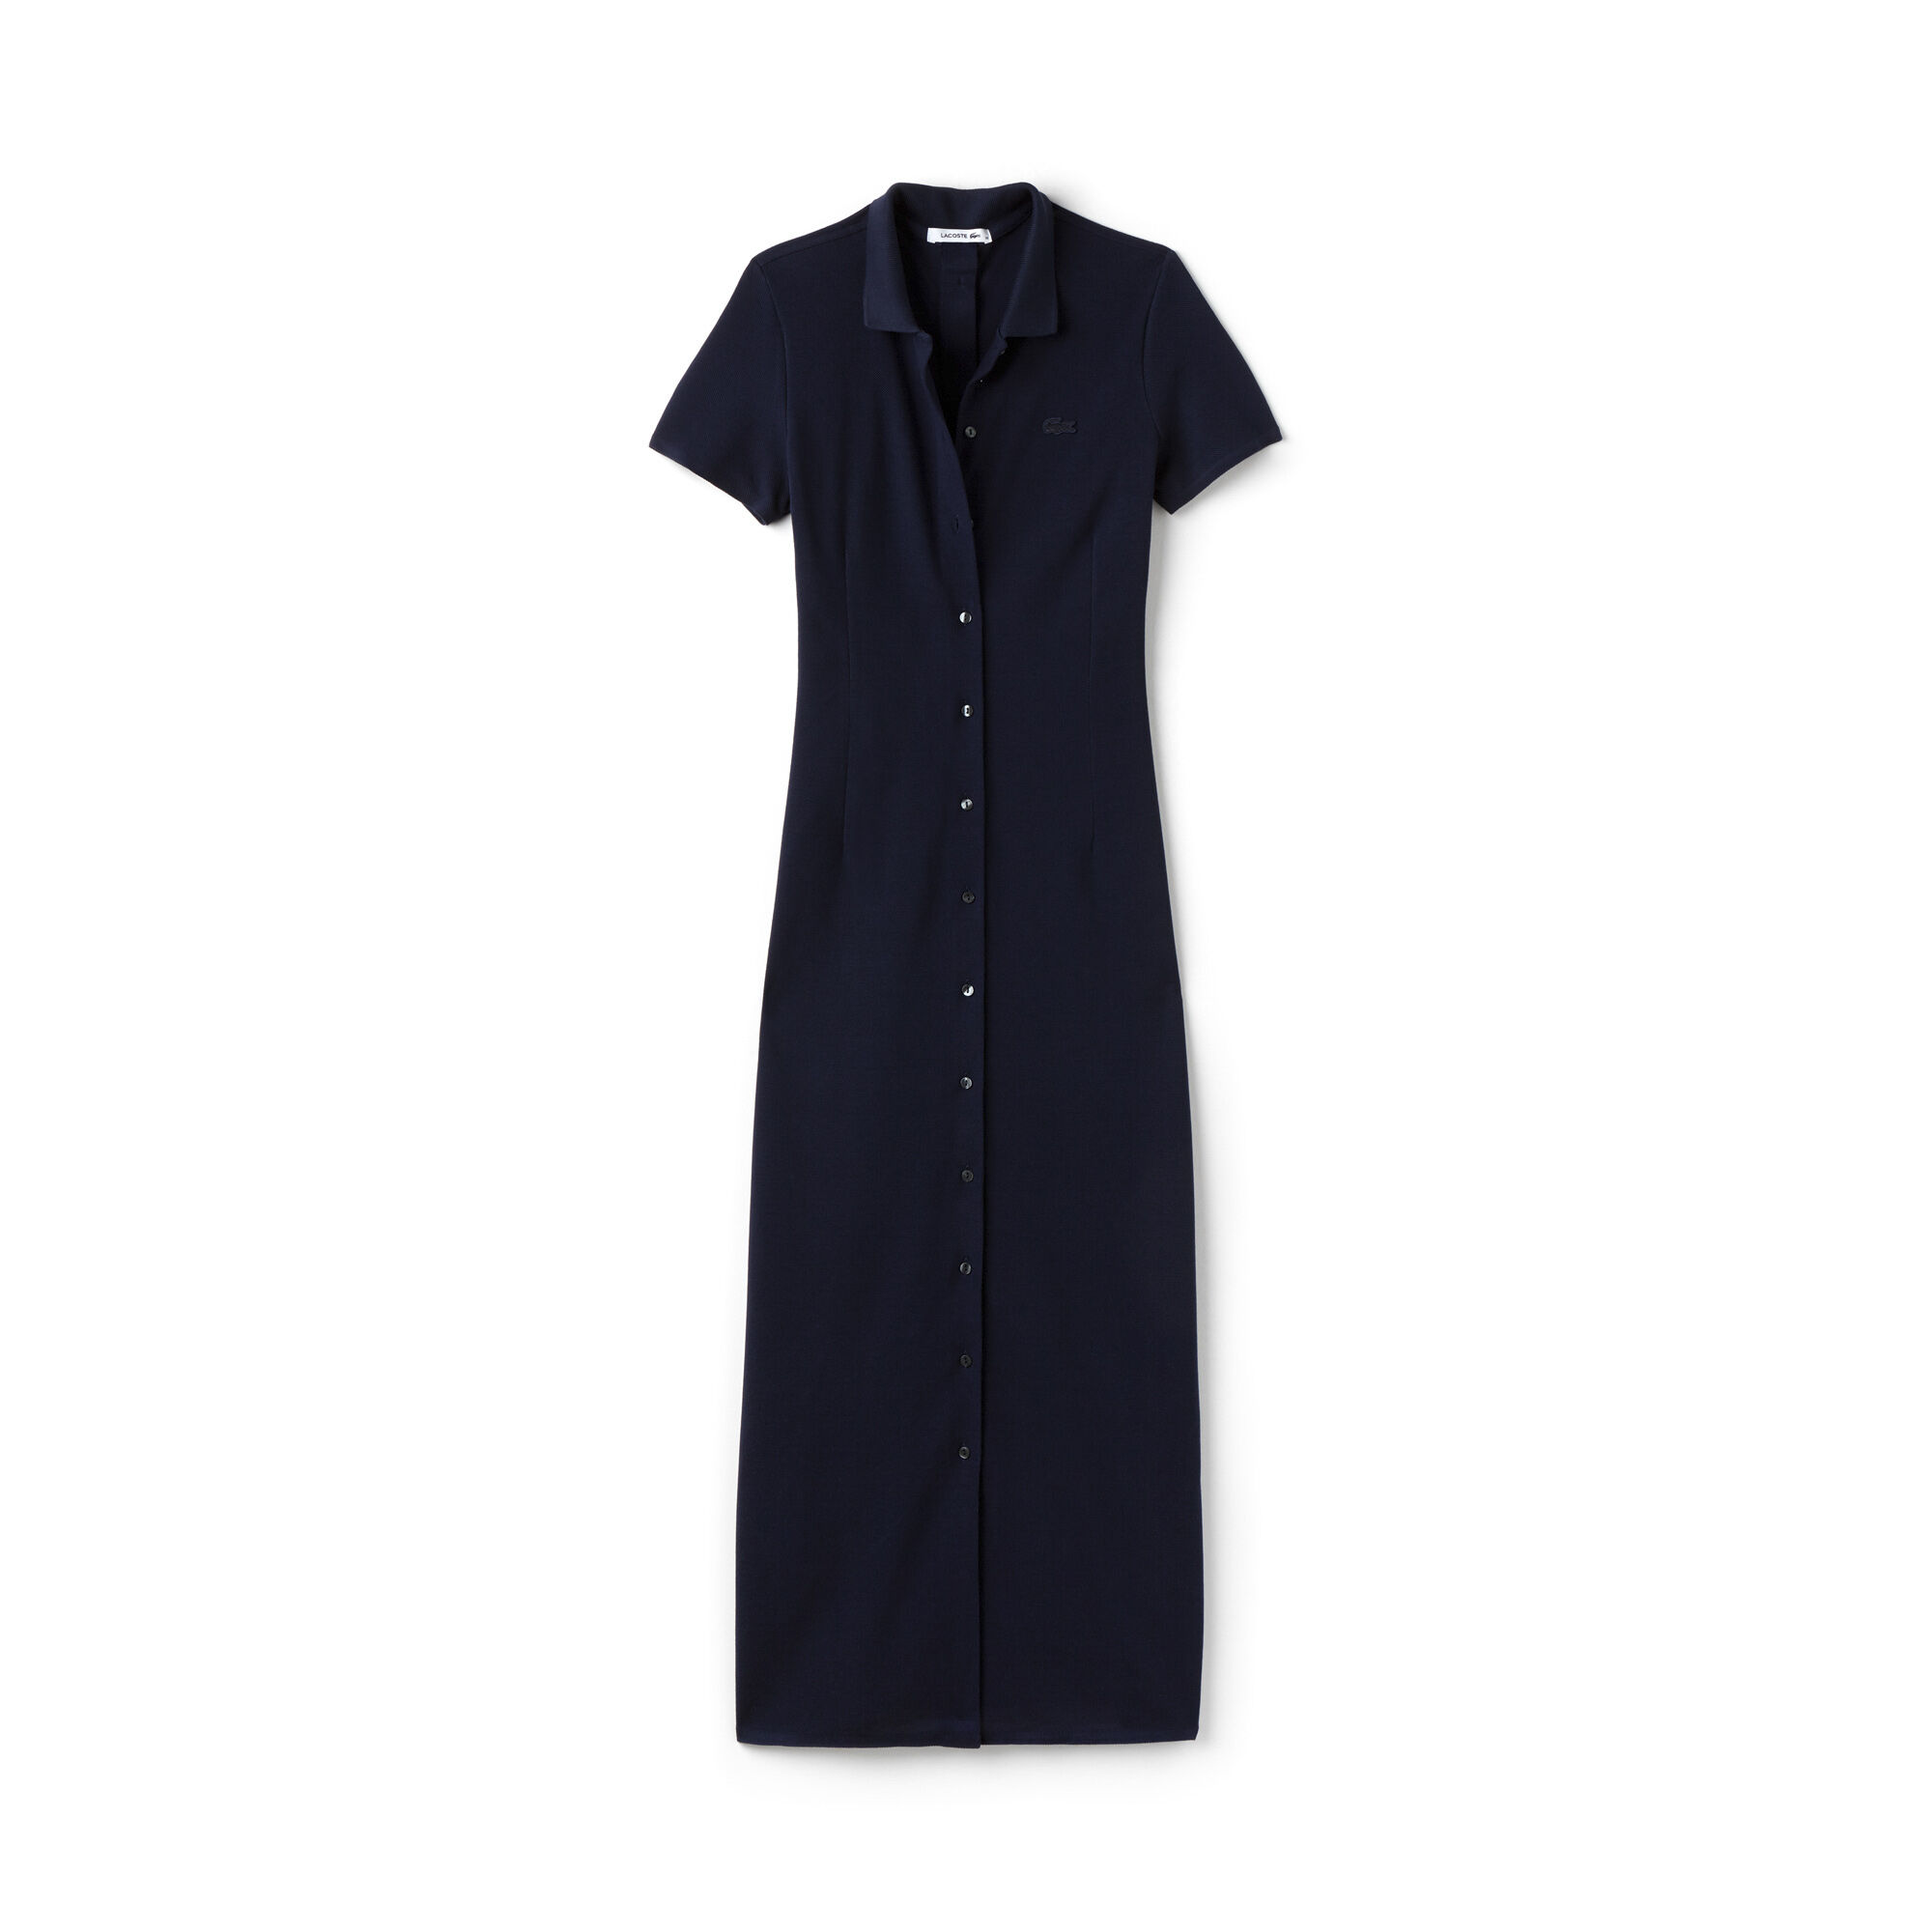 Black Lacoste Dress